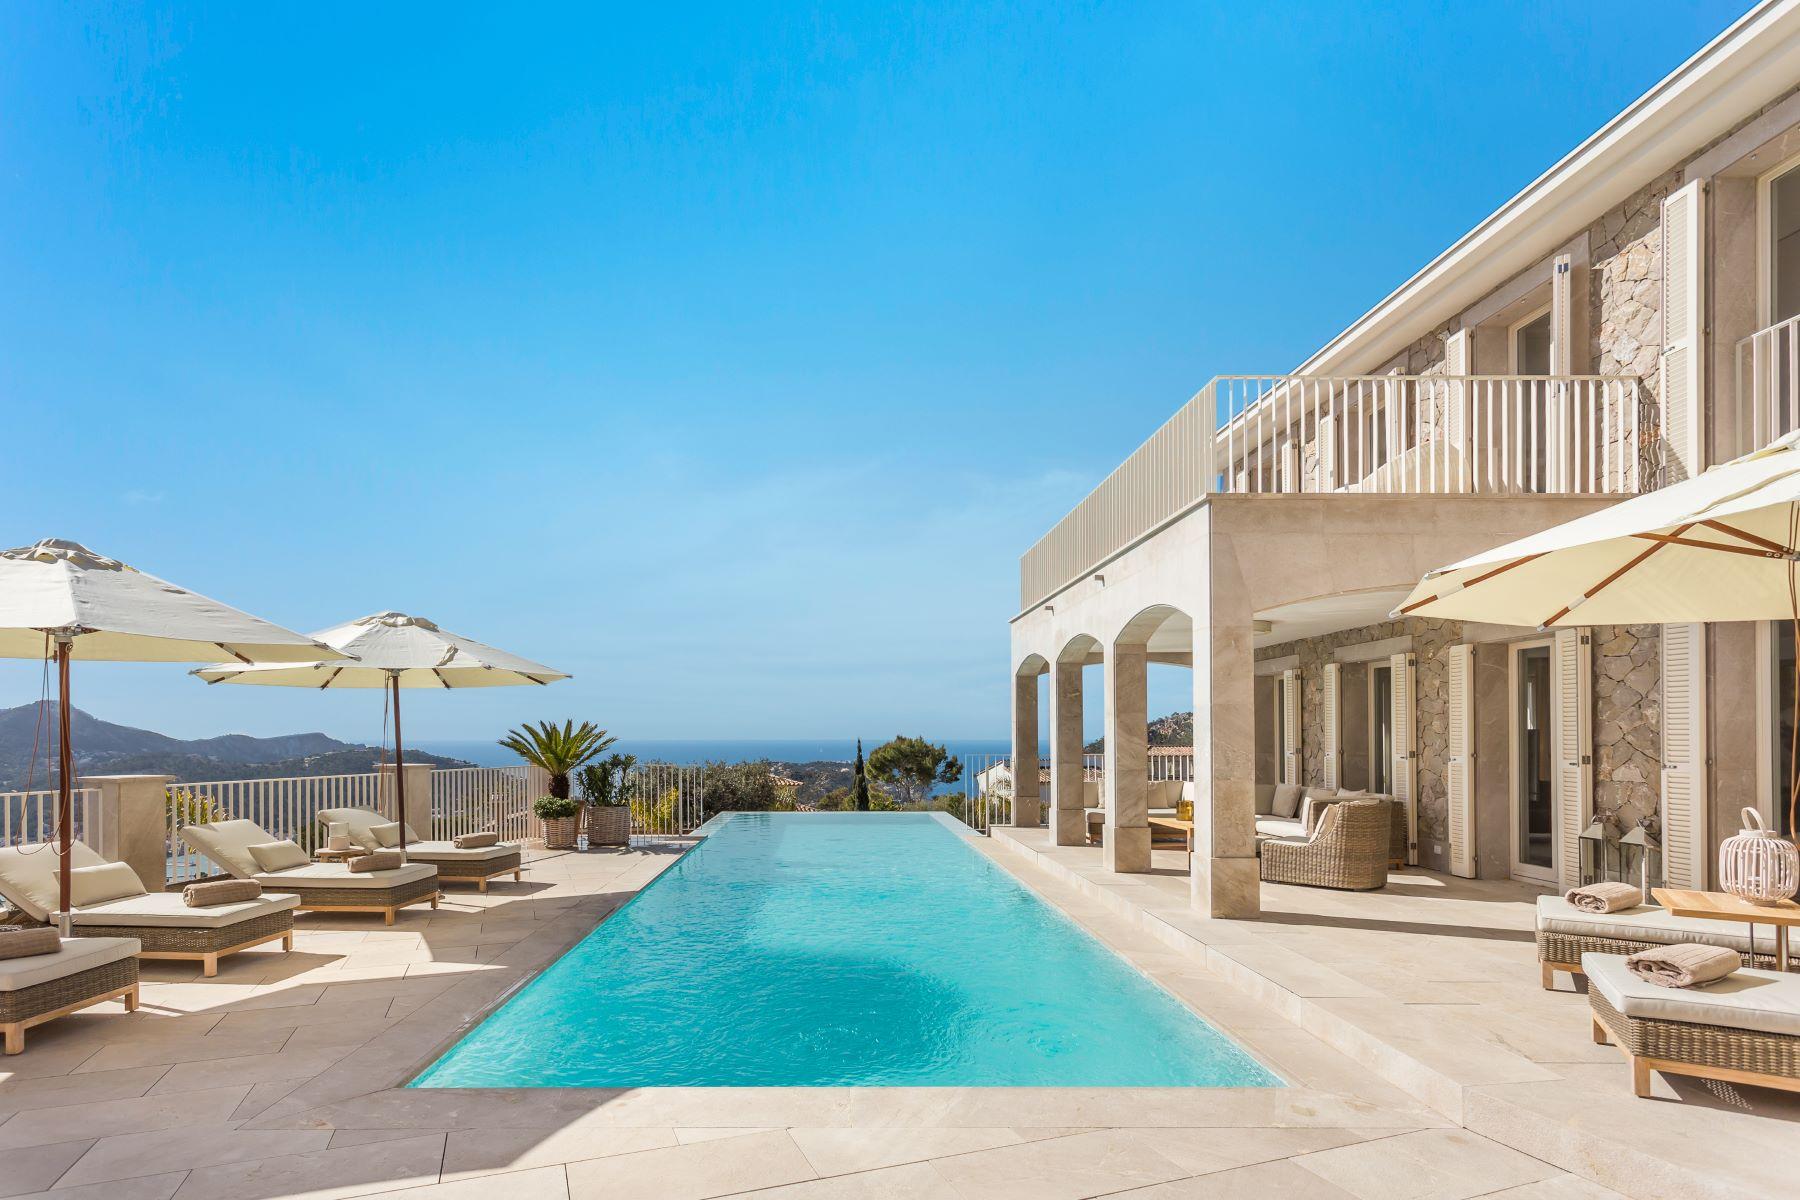 Moradia para Venda às Luxury villa with panoramic views in Port Andratx Port Andratx, Palma De Maiorca, Espanha